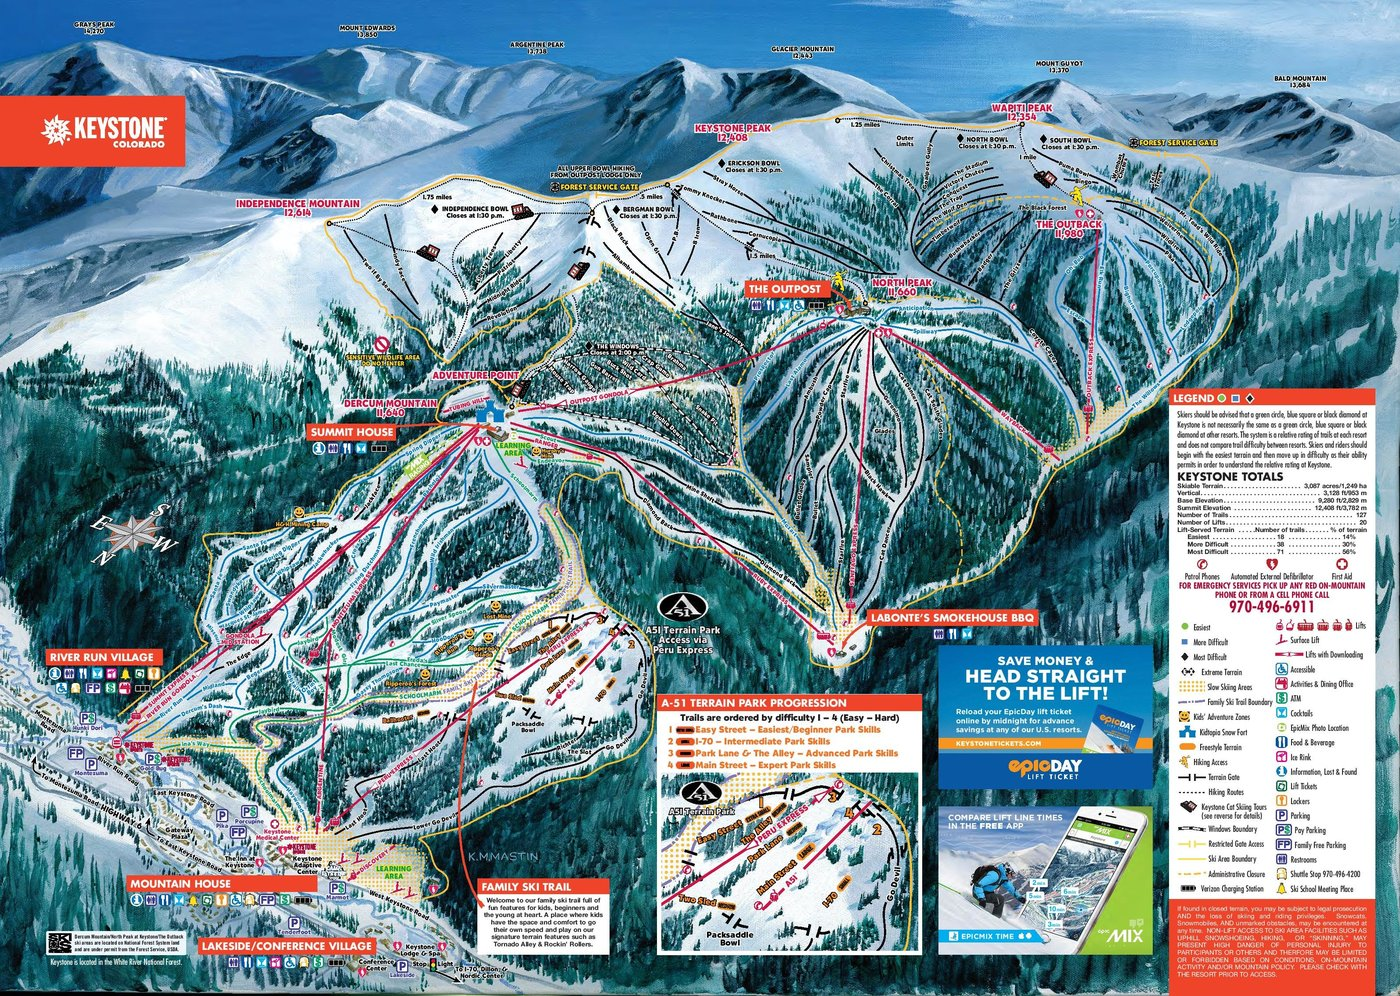 Keystone Resort Trail Map